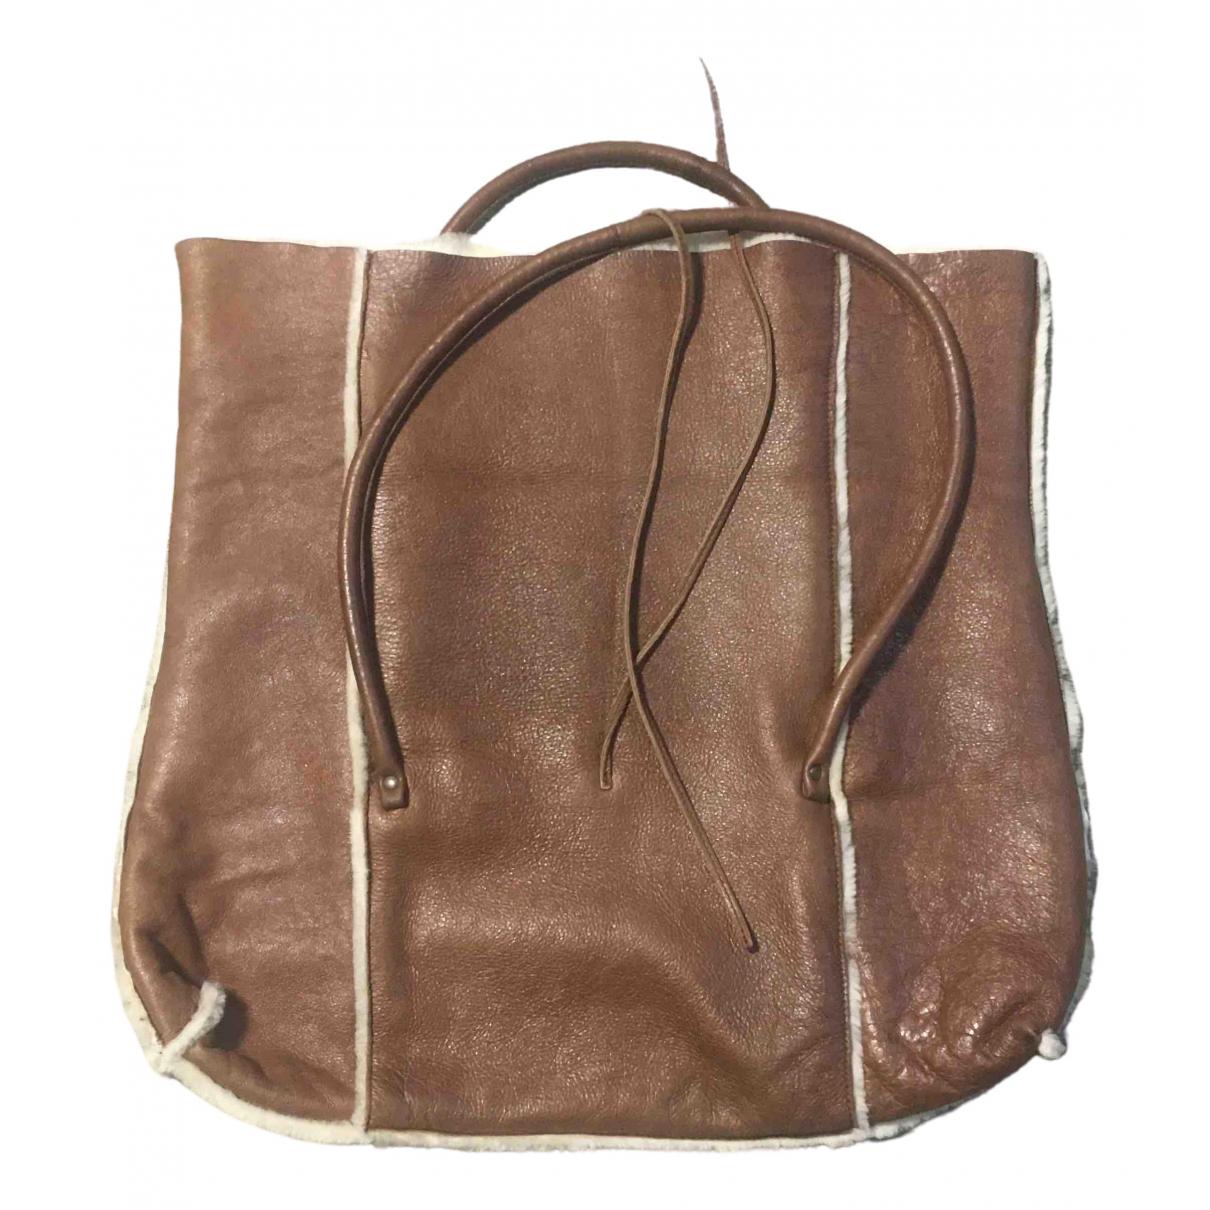 Miu Miu \N Handtasche in  Braun Fell